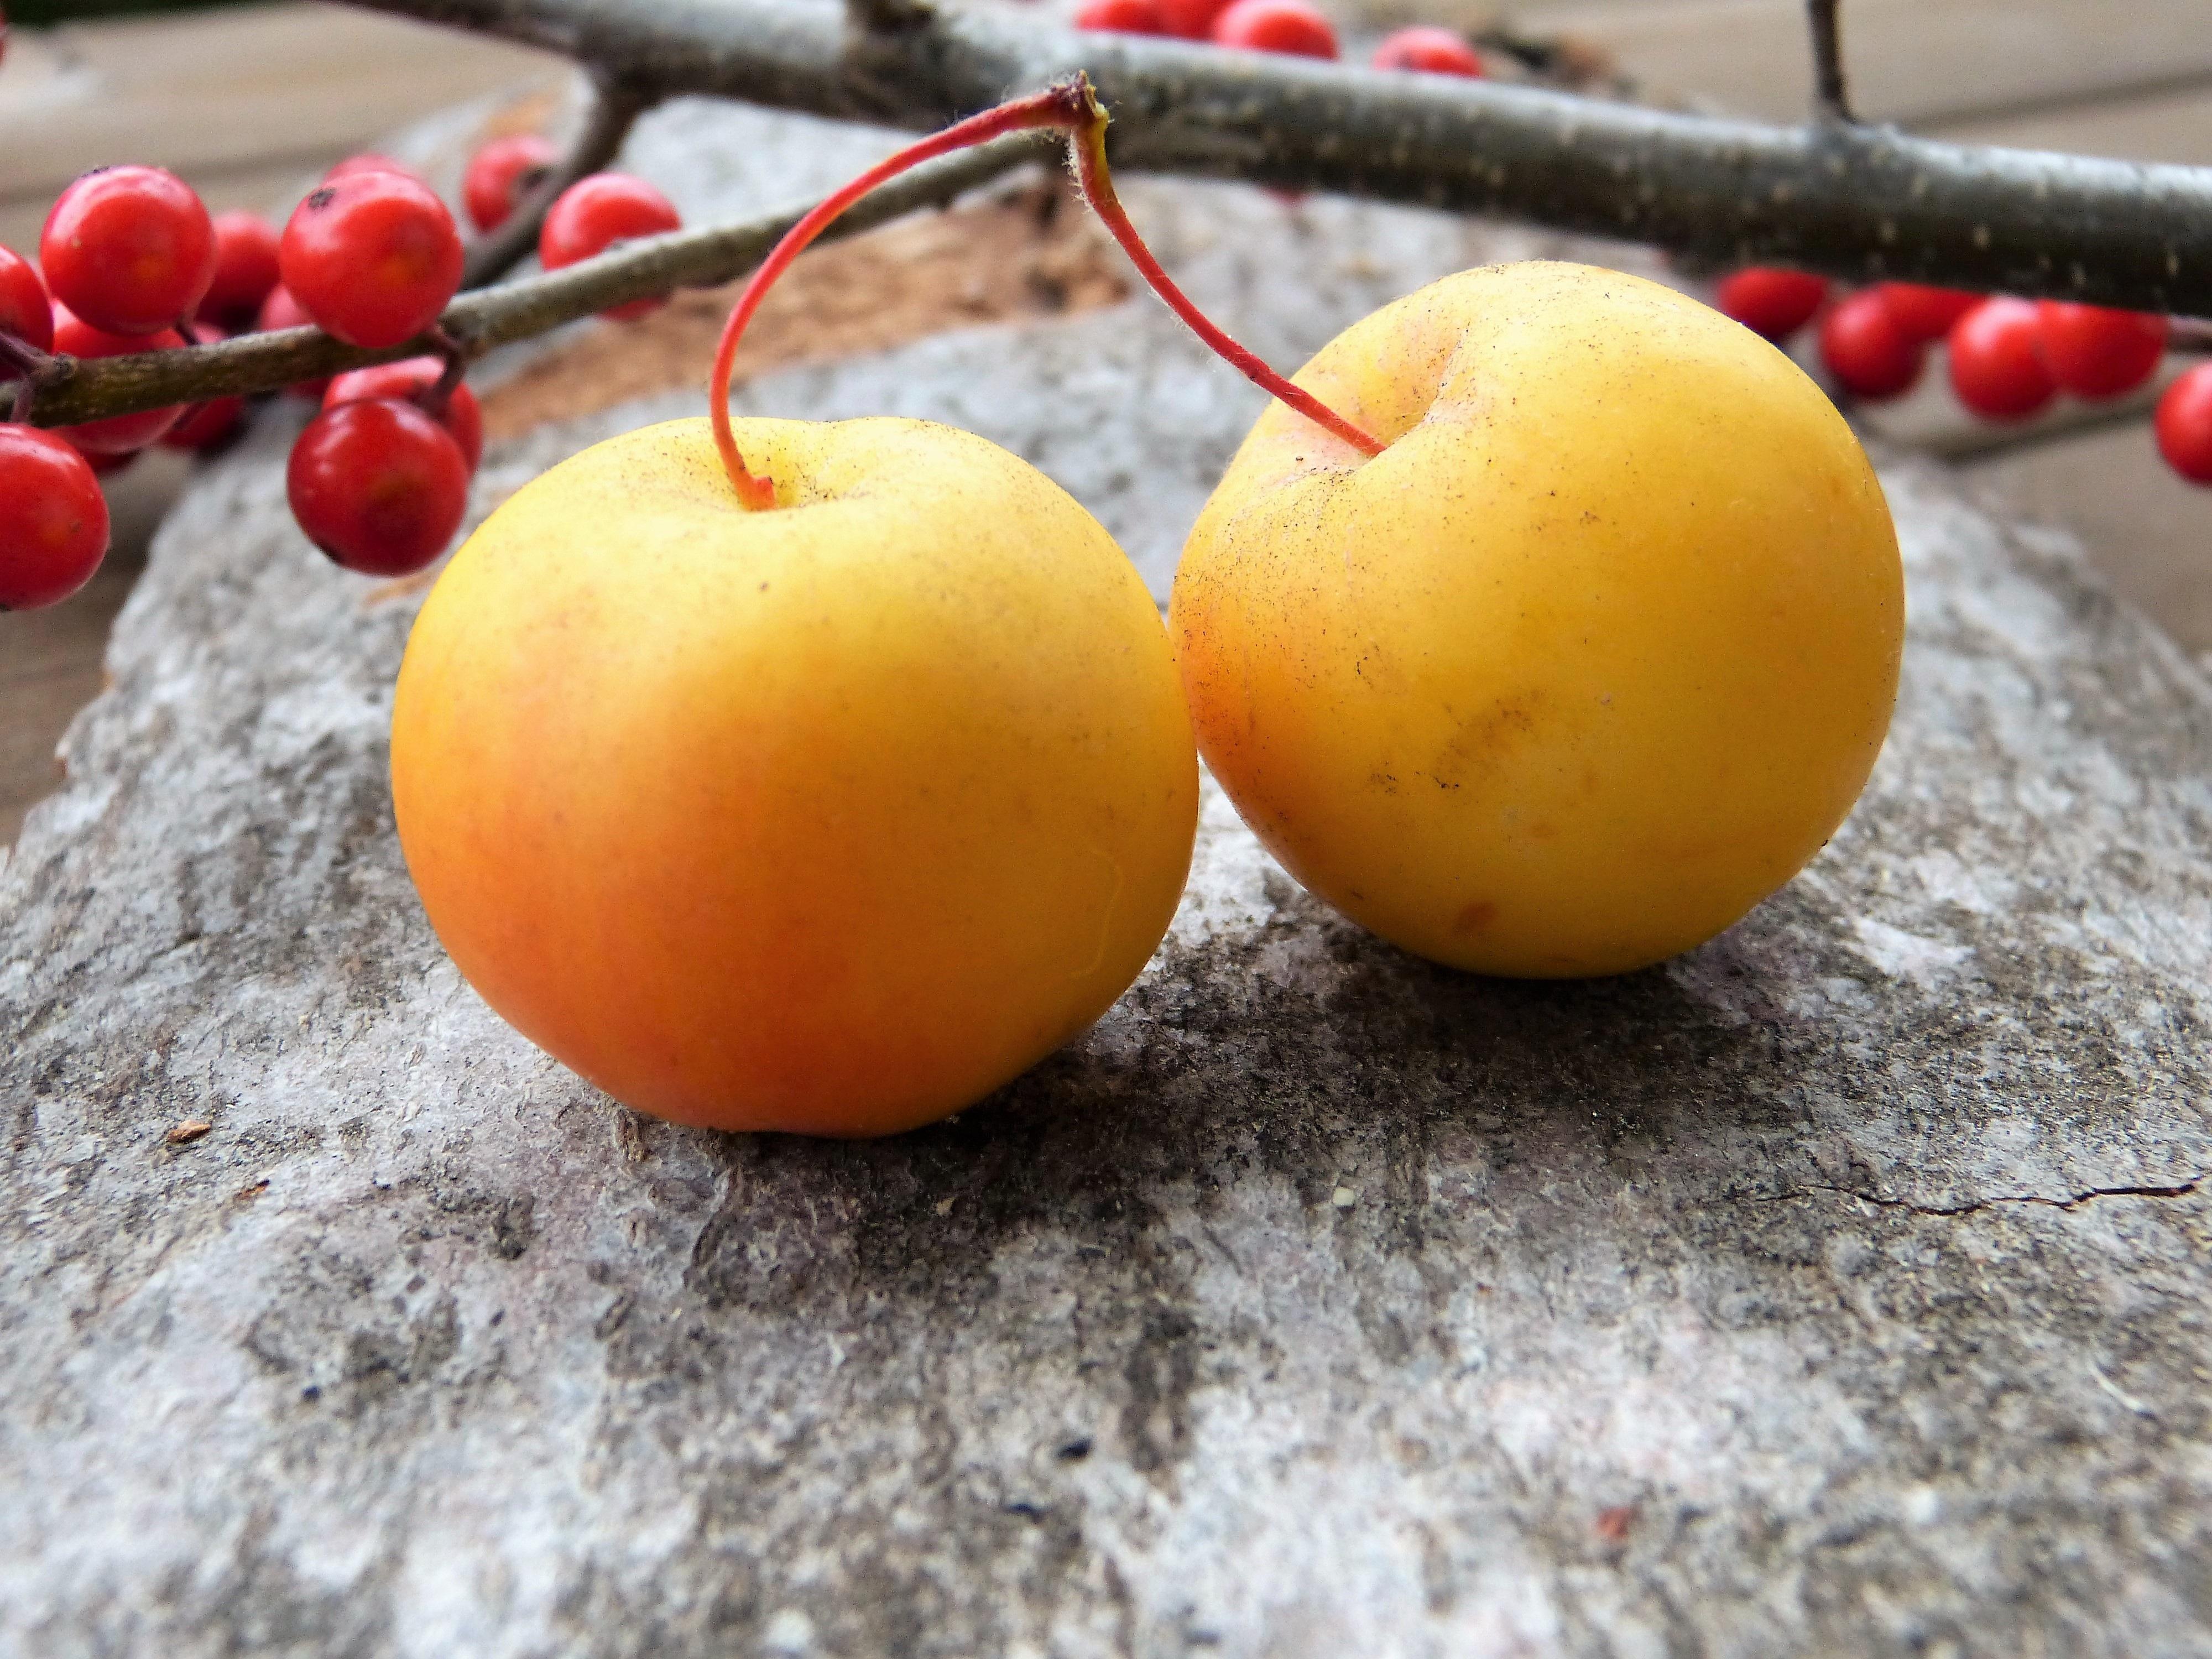 dekat benih burung kedatangan burung burung buah buahan dimakan perhiasan pohon hias tanaman berbunga keluarga mawar zieraepfel buah hias